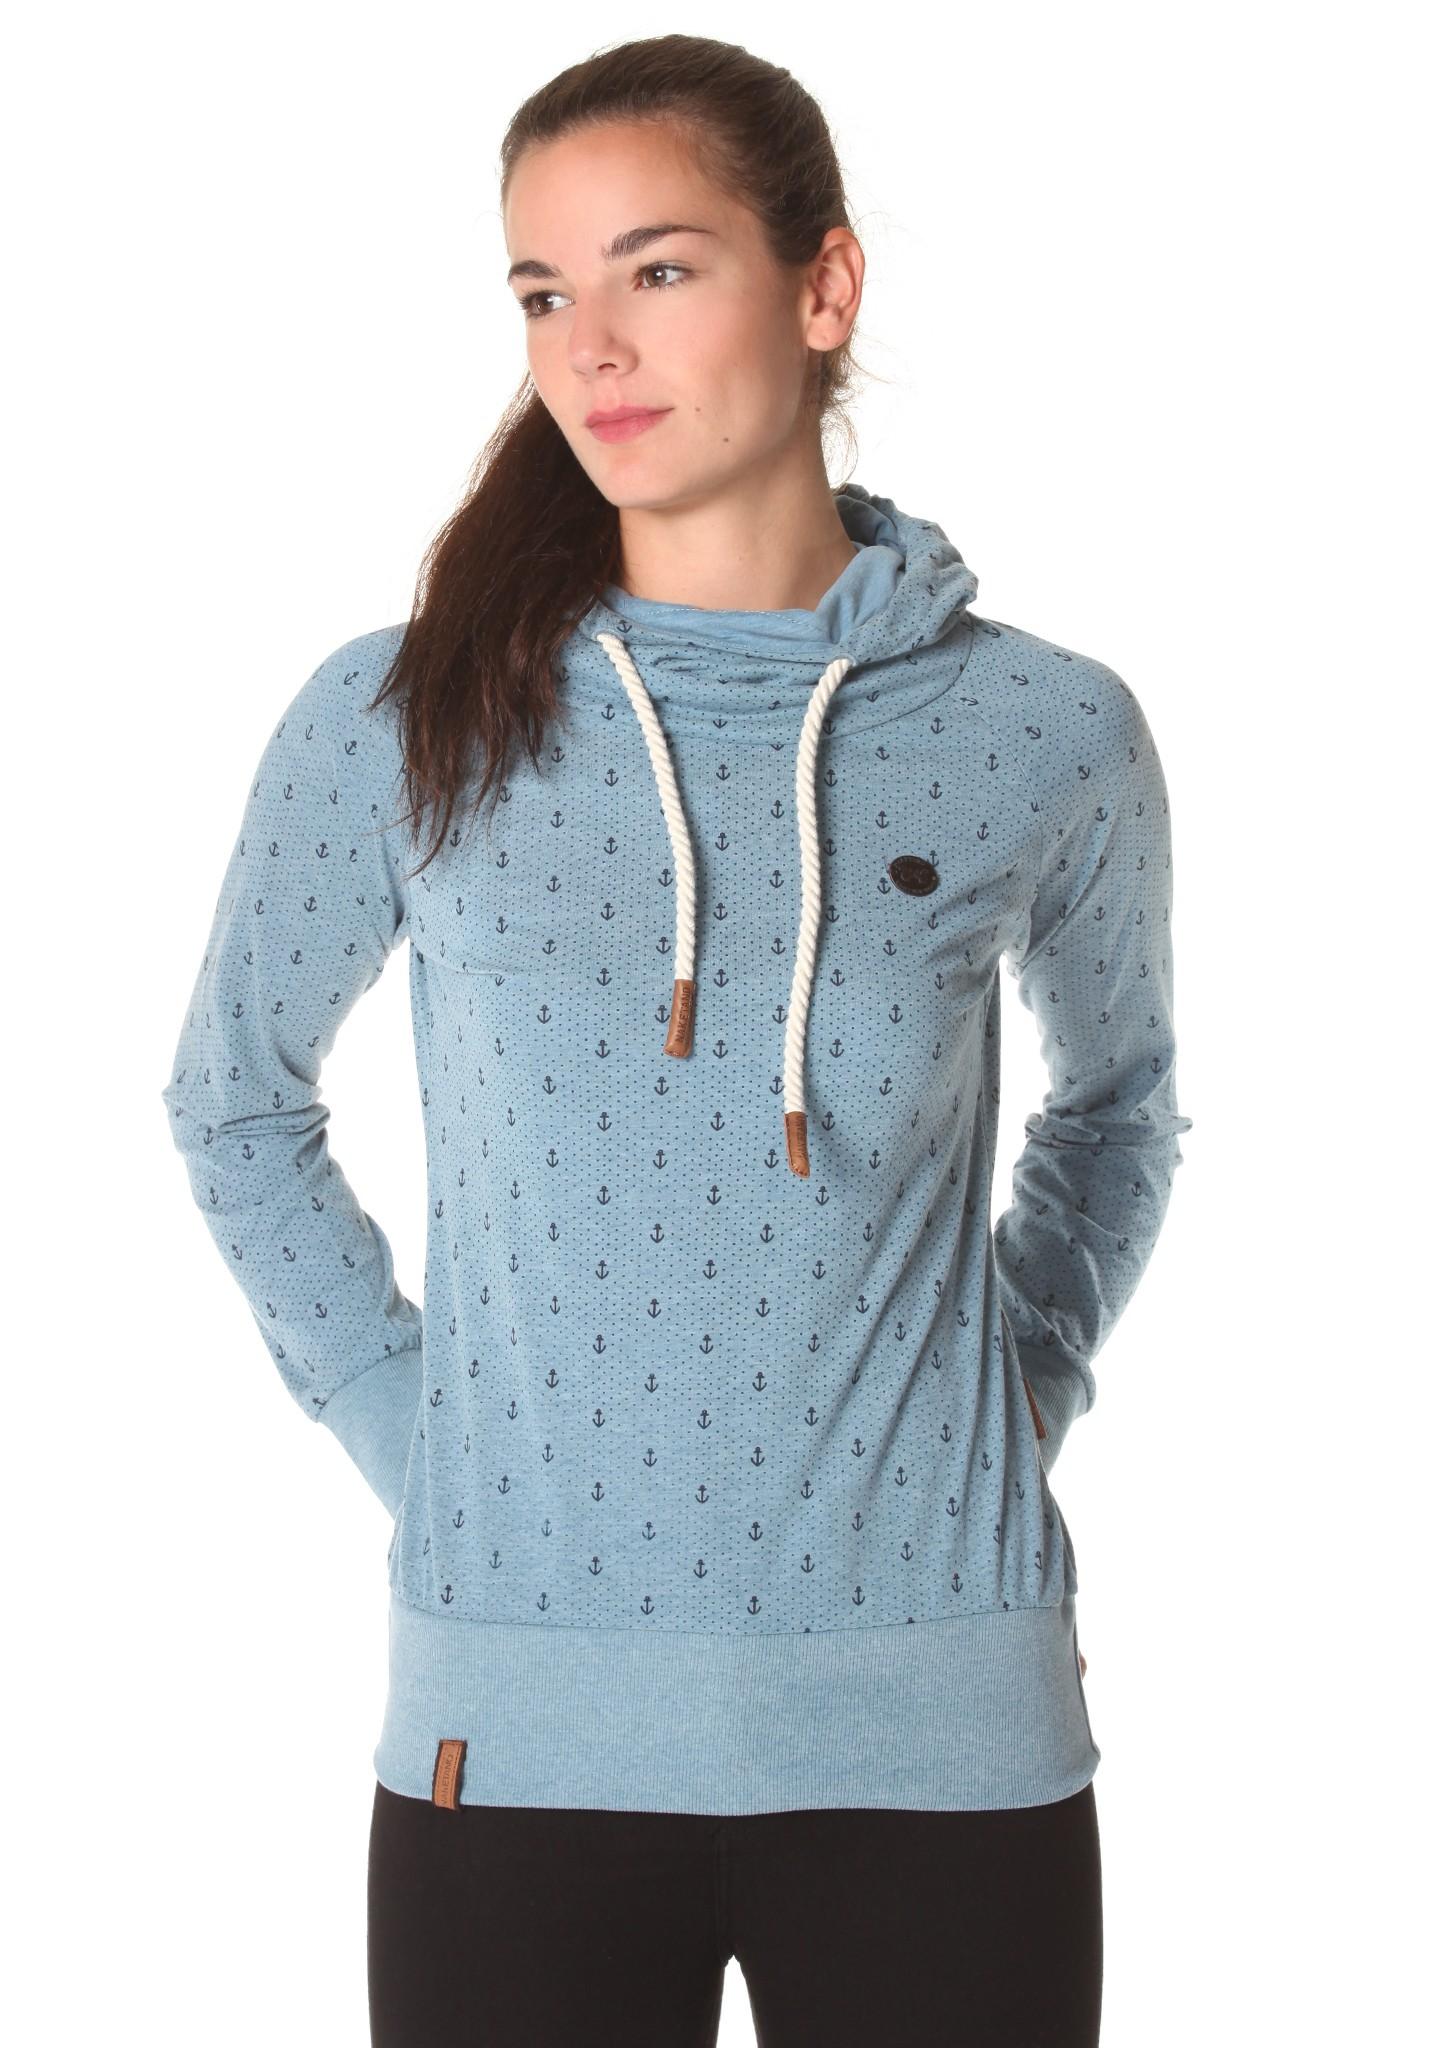 neu naketano mandy ankerdizzel damen kapuzenpullover pullover hoodie ebay. Black Bedroom Furniture Sets. Home Design Ideas